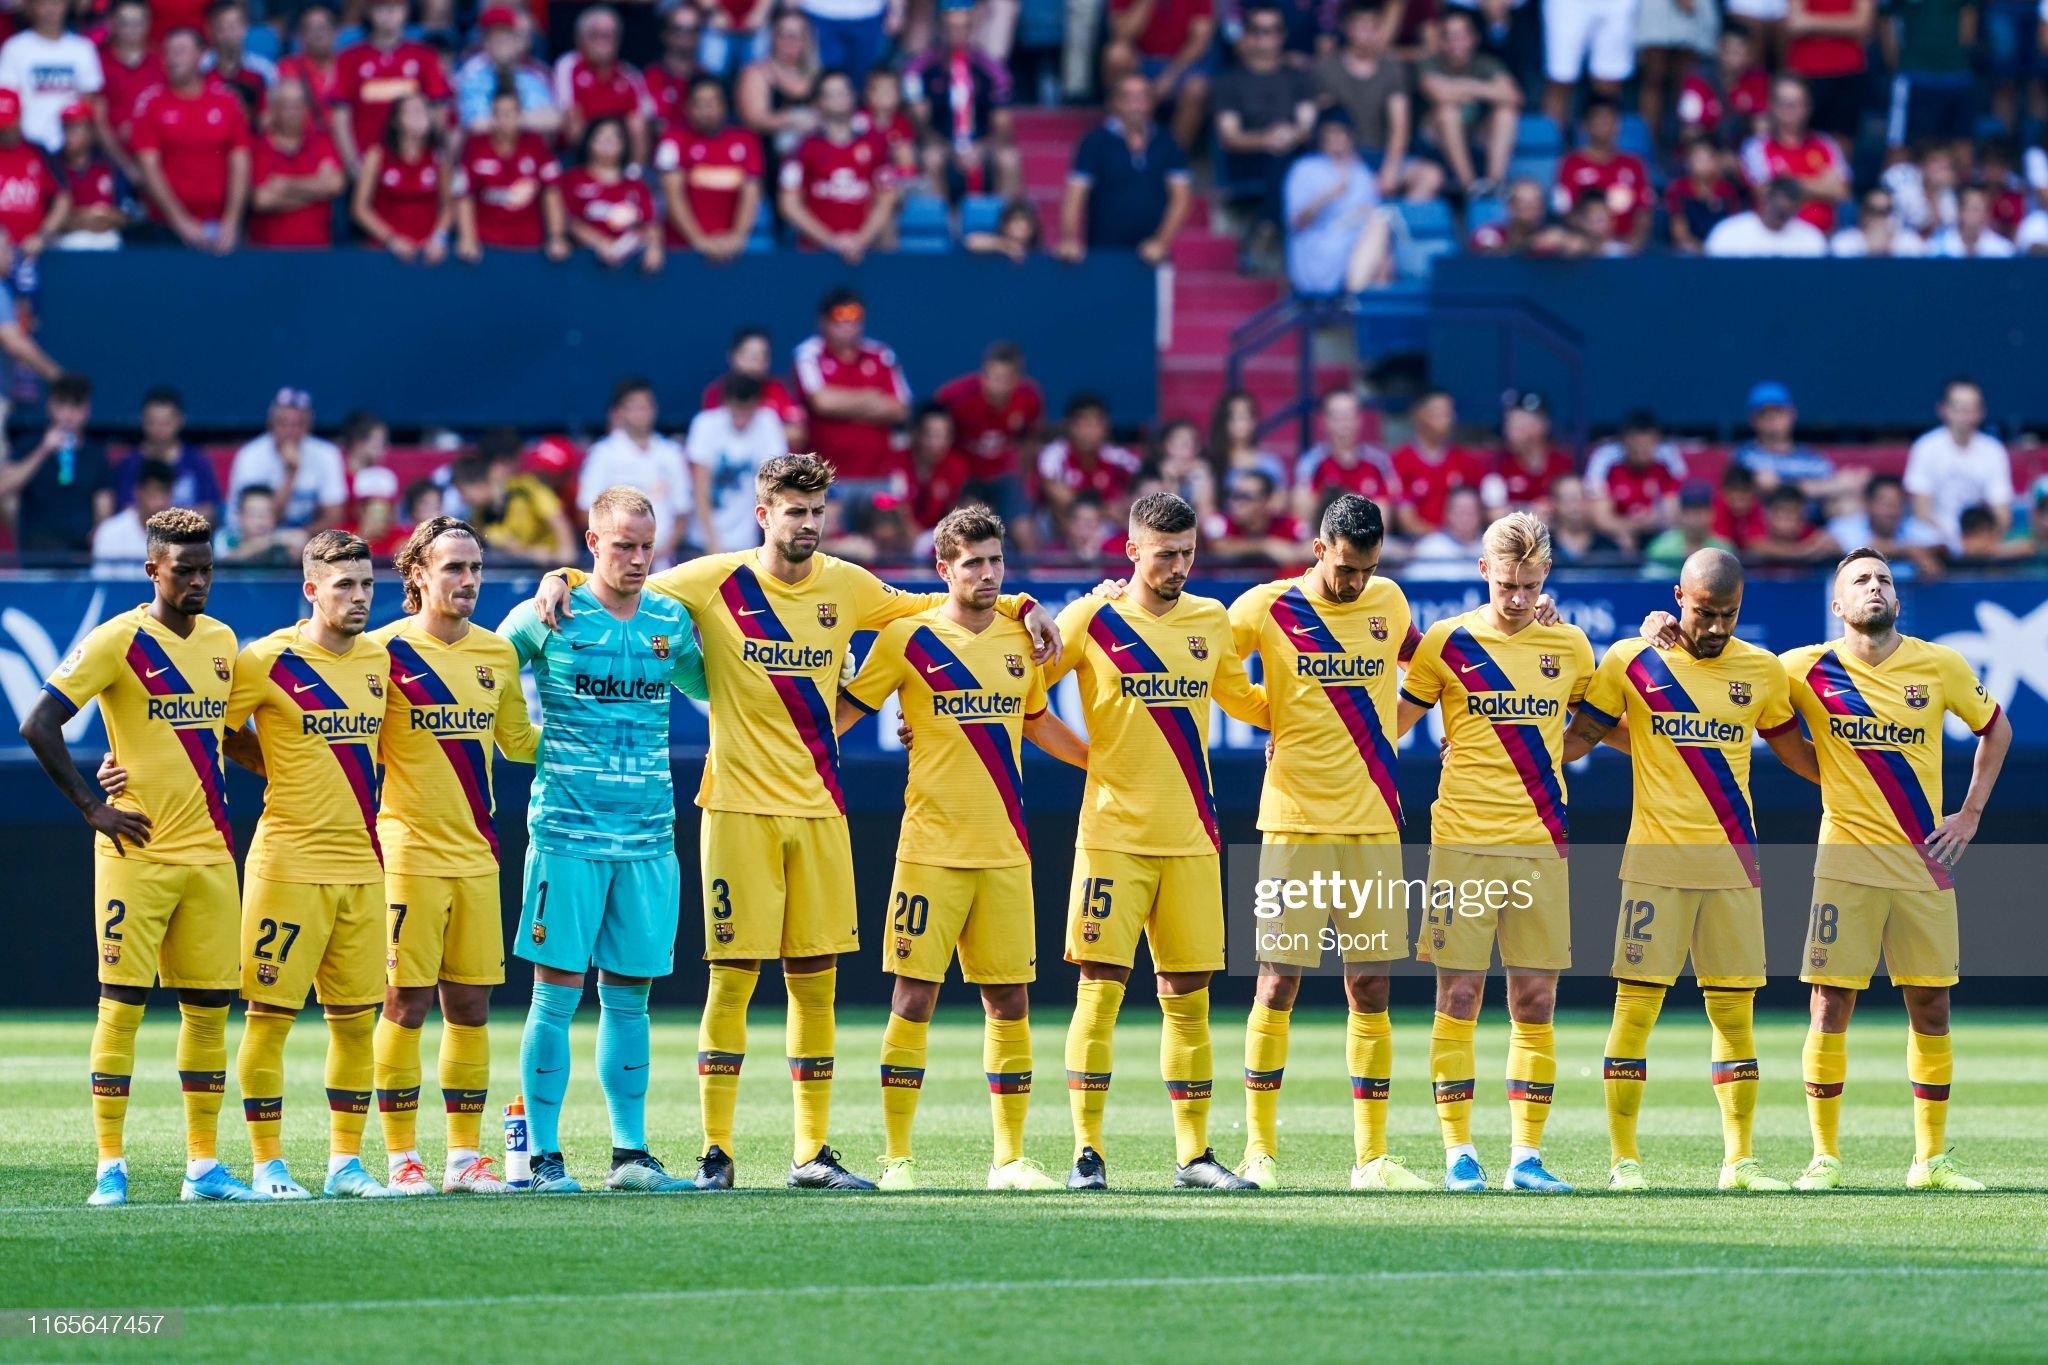 صور مباراة : أوساسونا - برشلونة 2-2 ( 31-08-2019 )  Barcelona-team-during-the-liga-match-between-osasuna-and-barcelona-at-picture-id1165647457?s=2048x2048